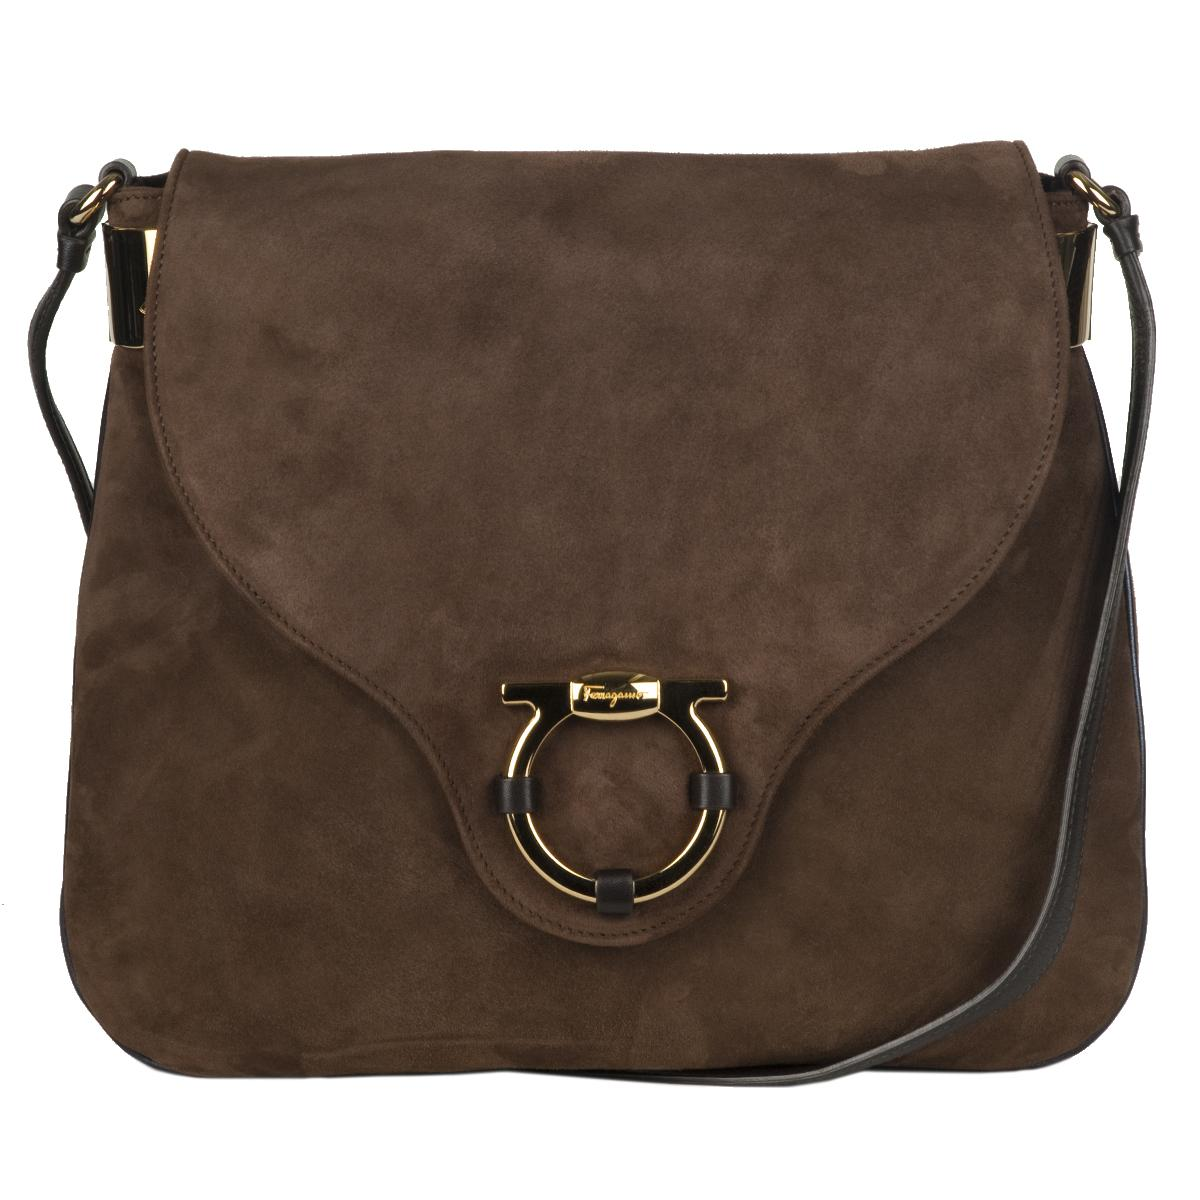 Salvatore Ferragamo Suede Brown Messenger Bag